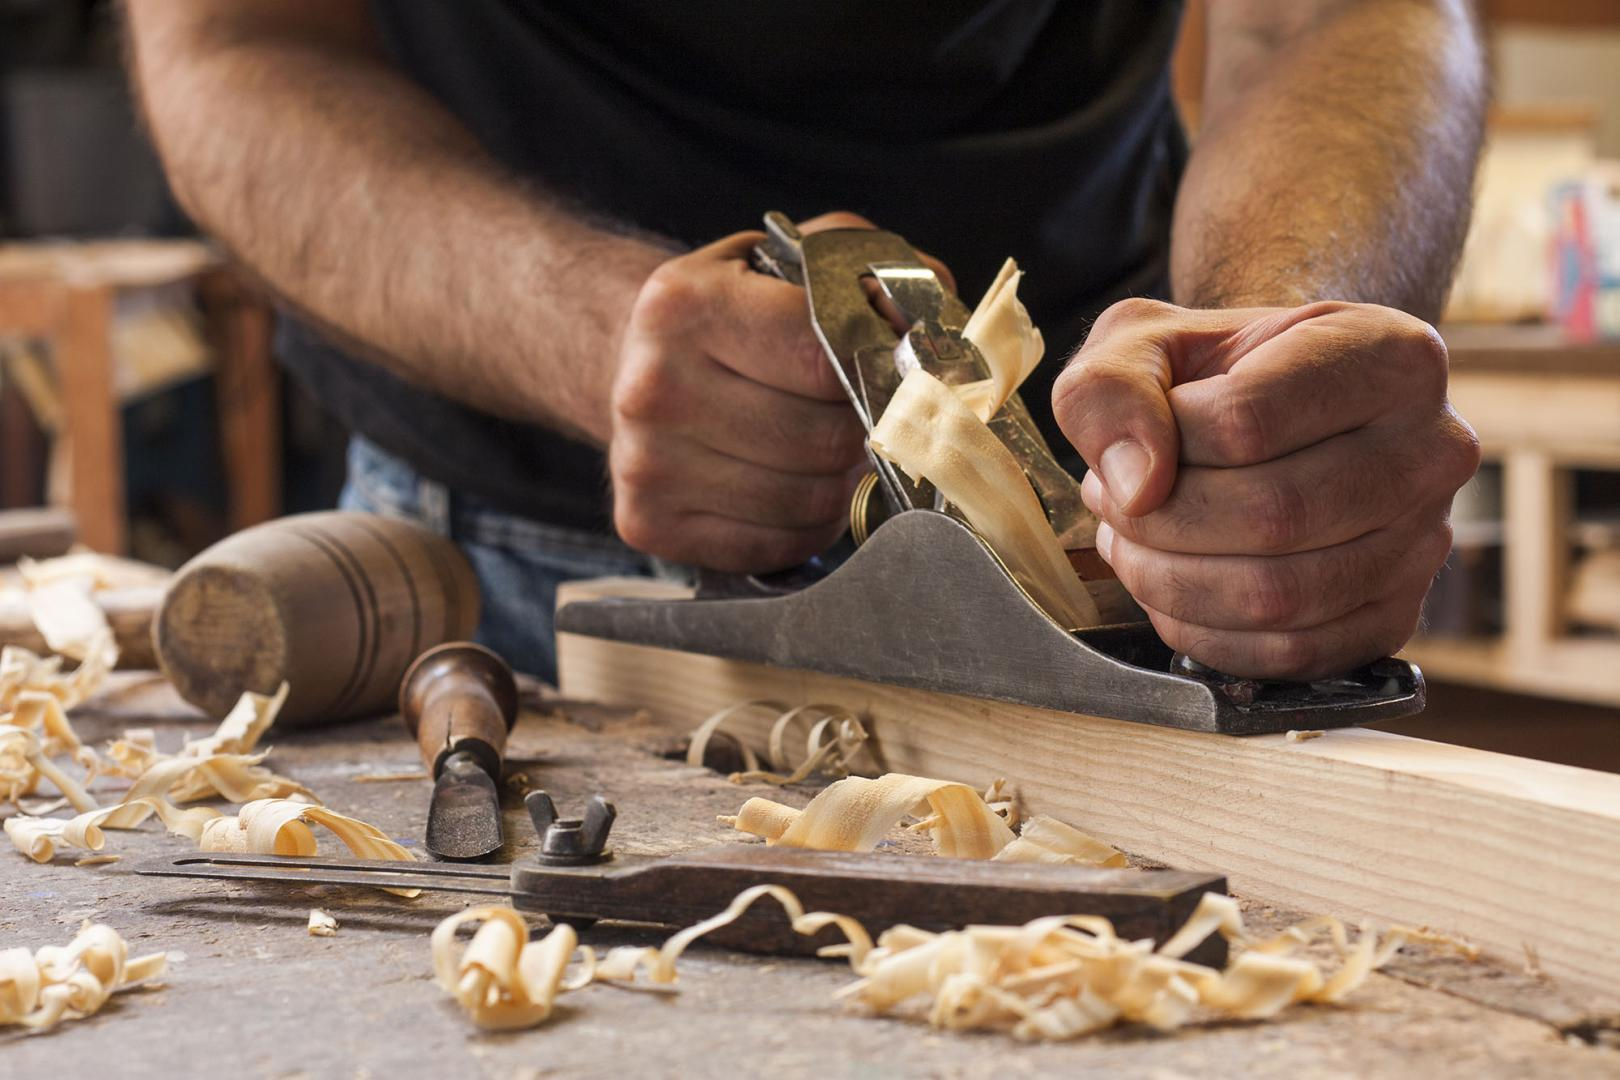 Fabricant De Meubles Brebi Res Douai Arras Marson Jean Pierre # Fabrication Meuble